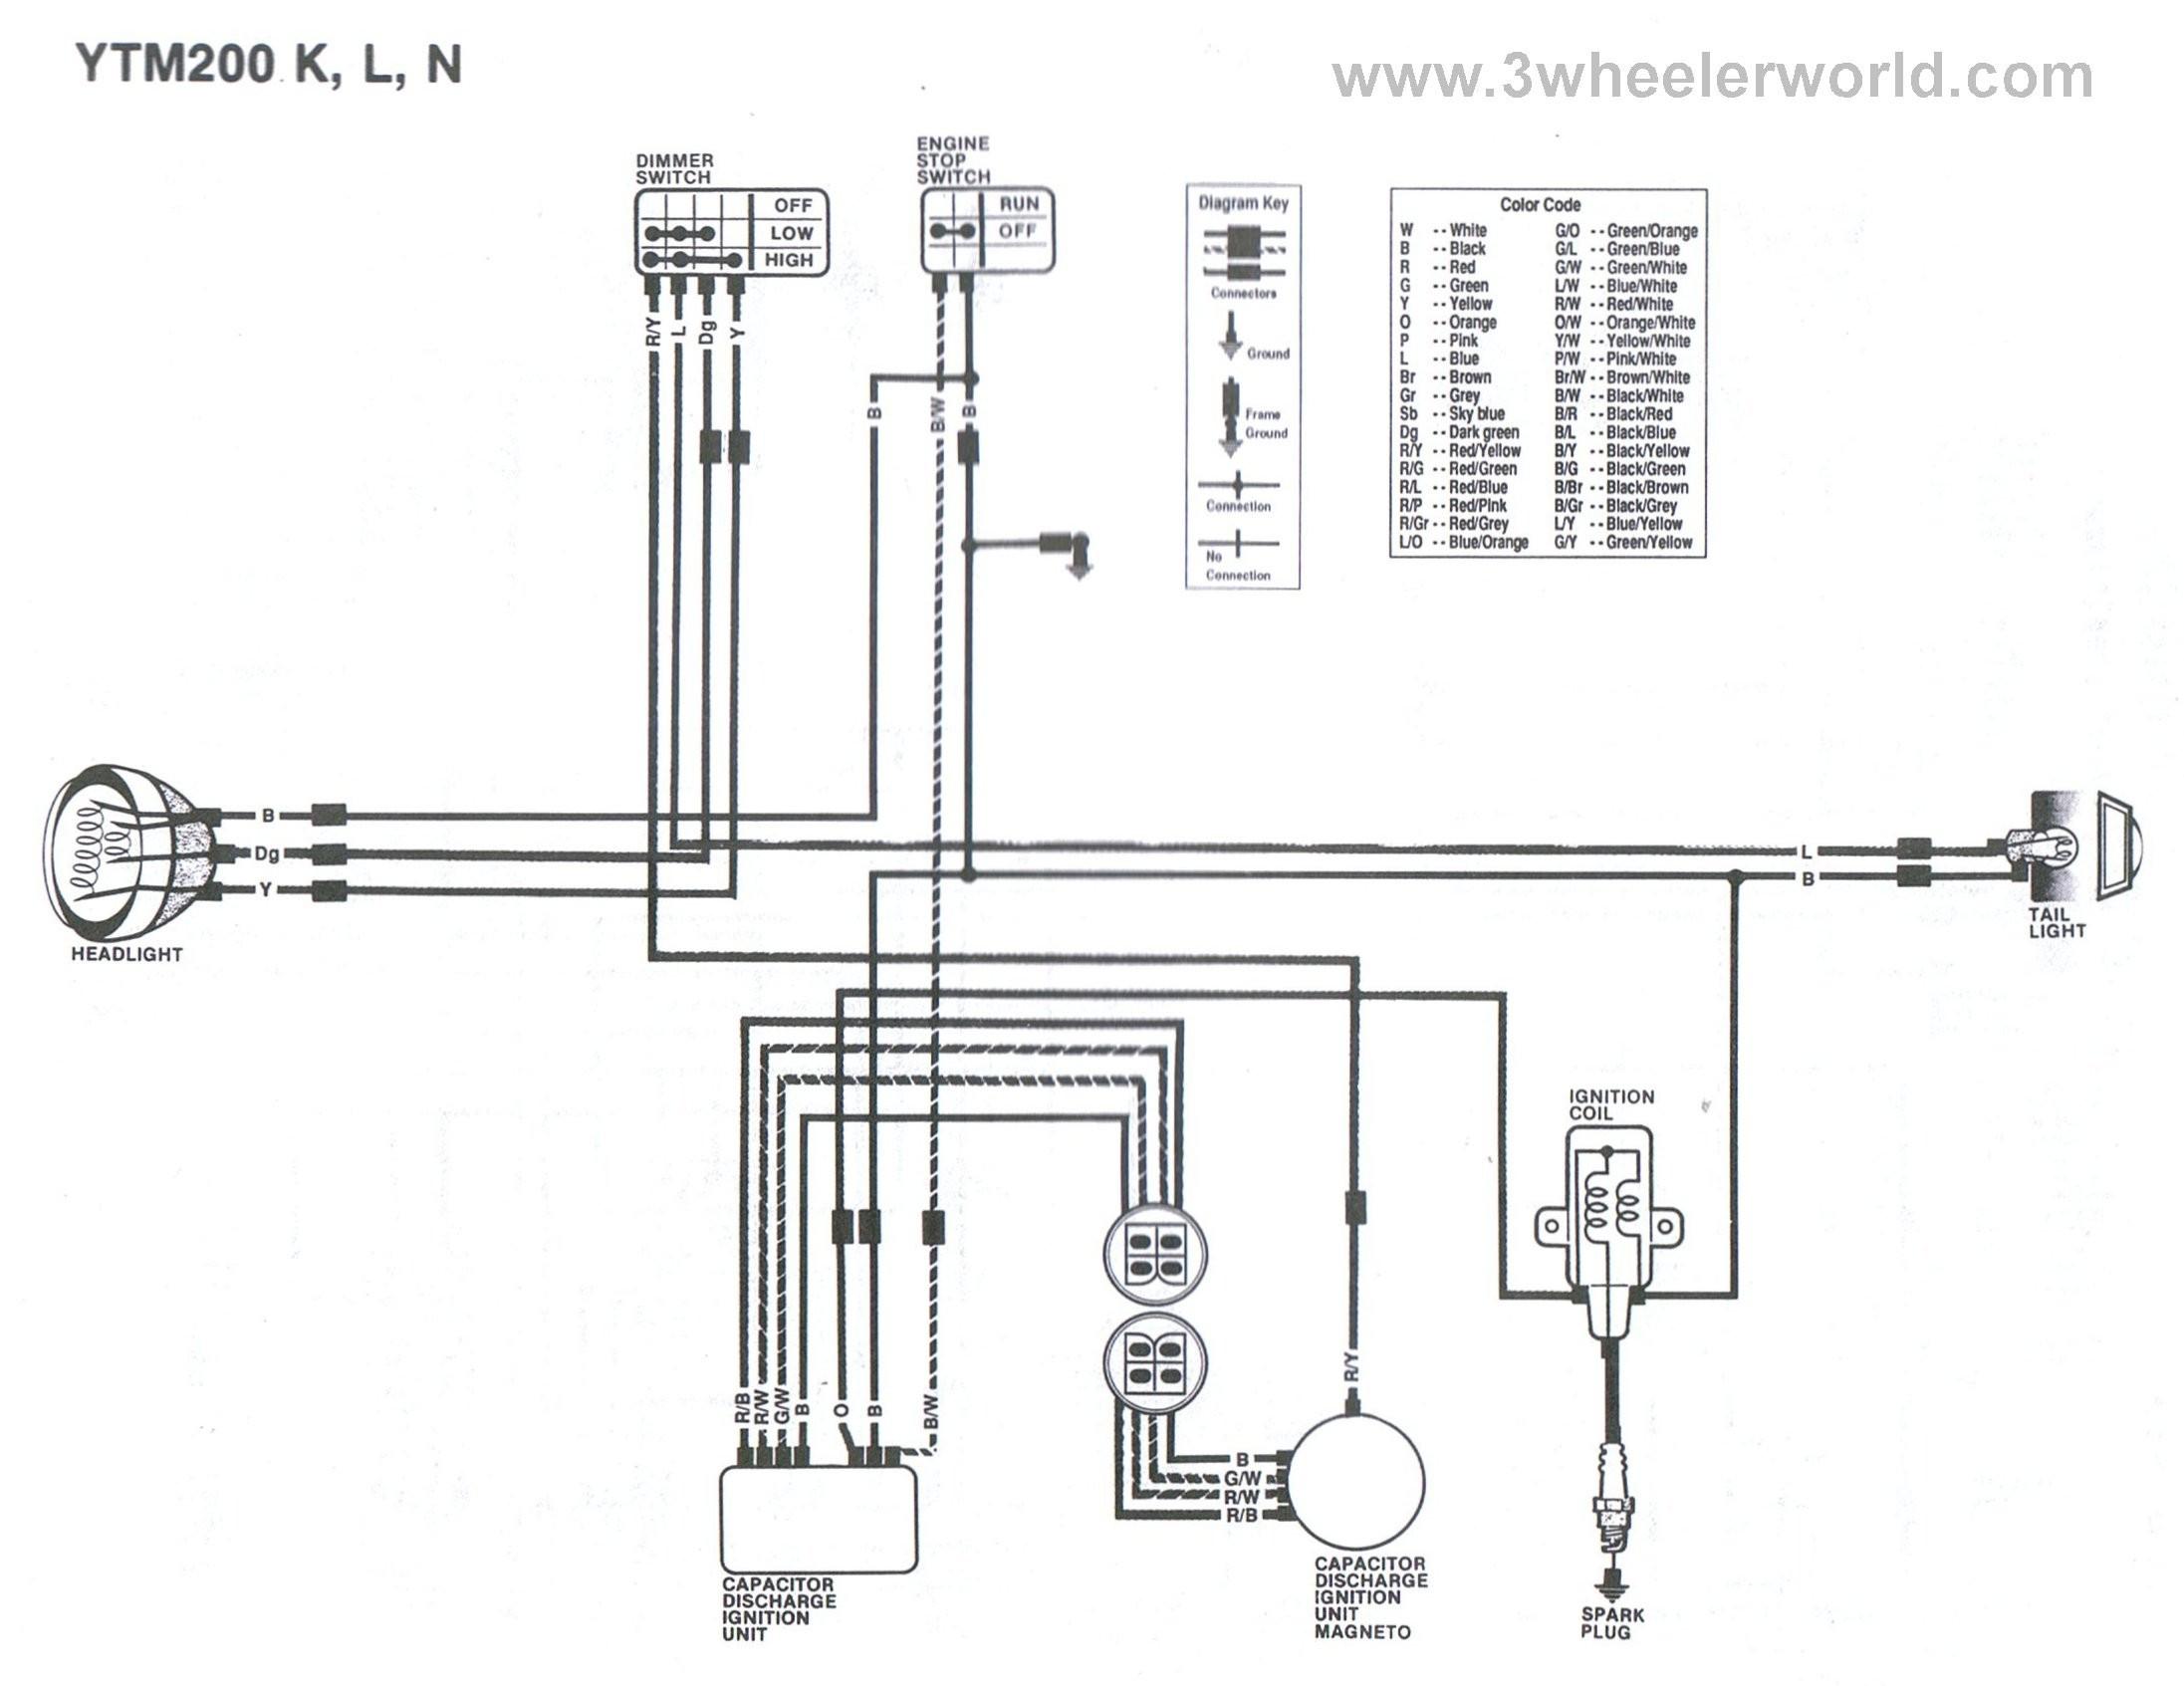 Yamaha 200 Blaster Wiring Diagram Reference Yamaha Blaster Wiring - Yamaha Blaster Wiring Diagram